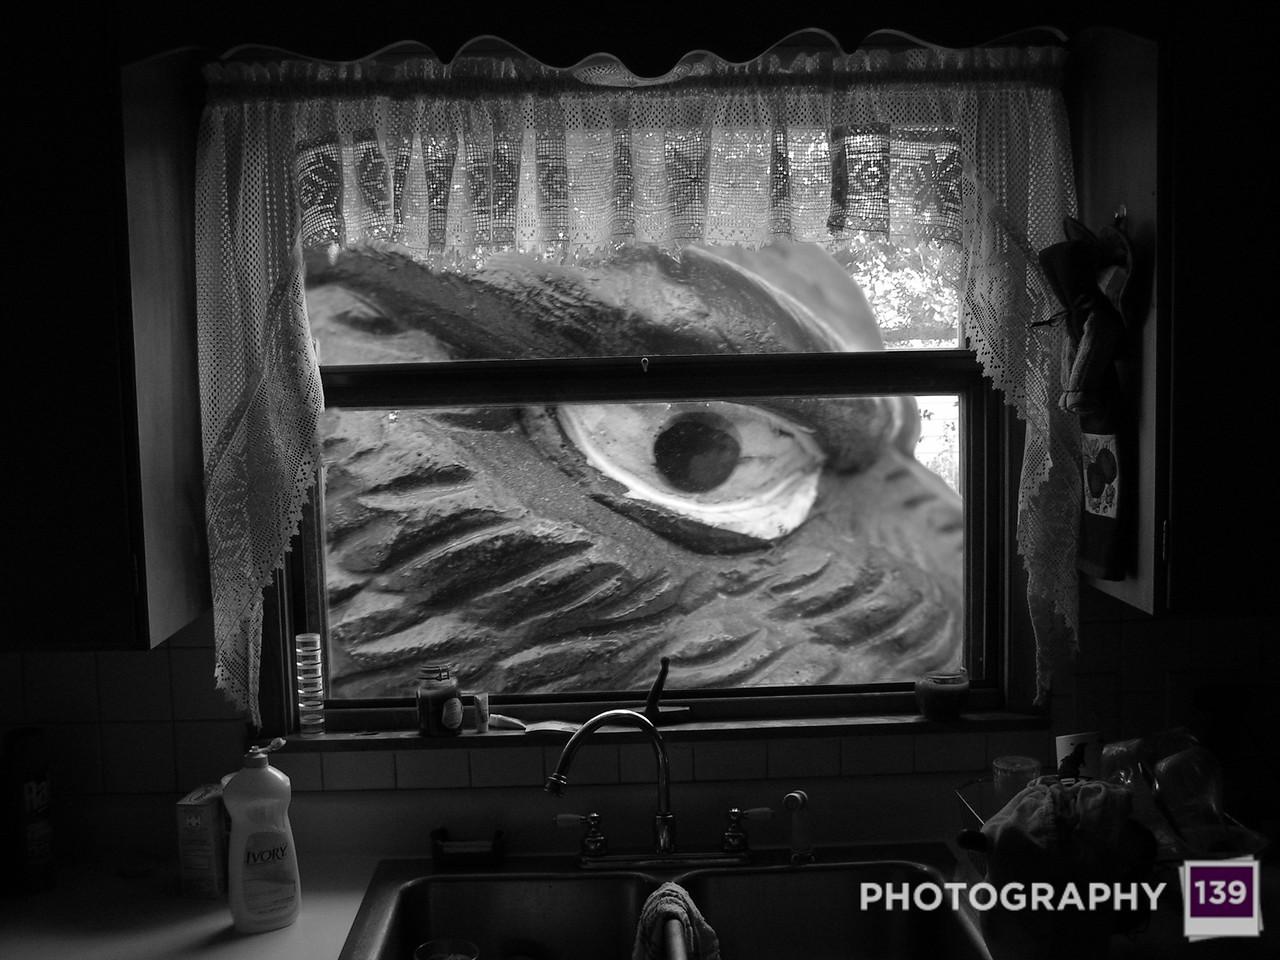 2005 Boone County Fair Photography Contest - Eye of the Beast